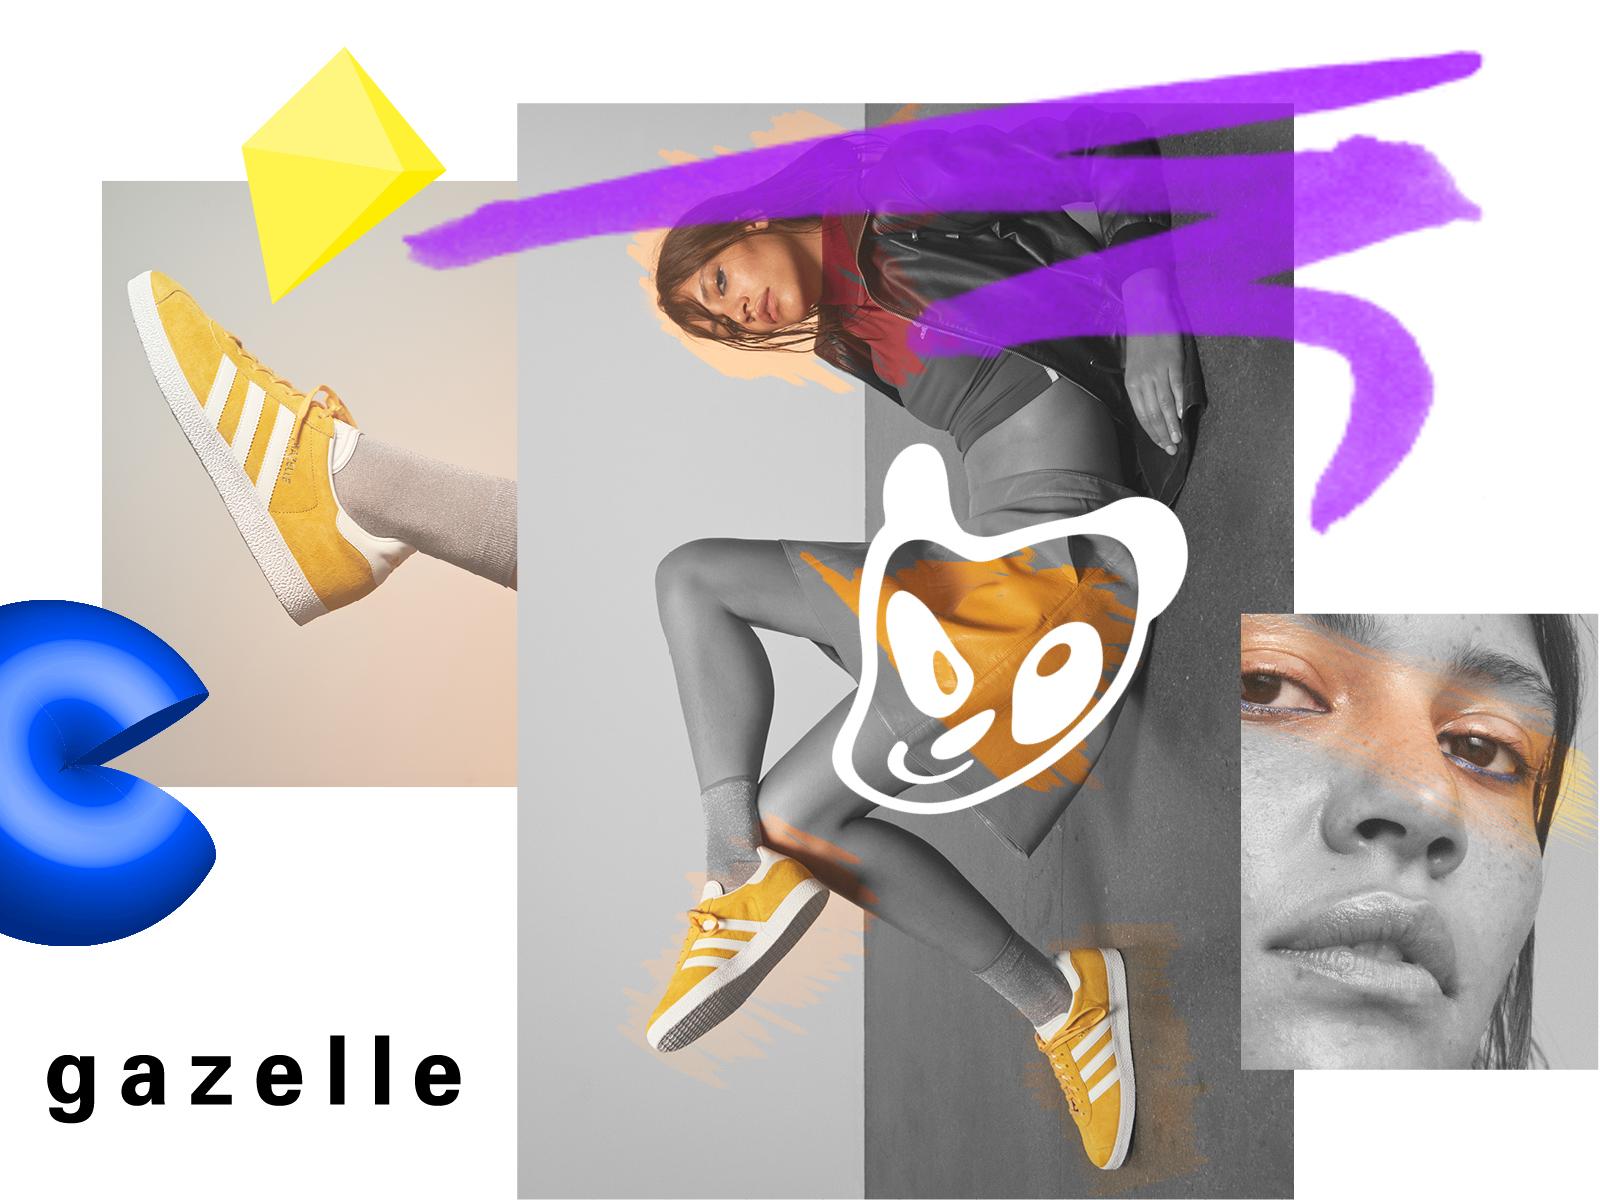 Adidas Gazelle Collage_1200x90052